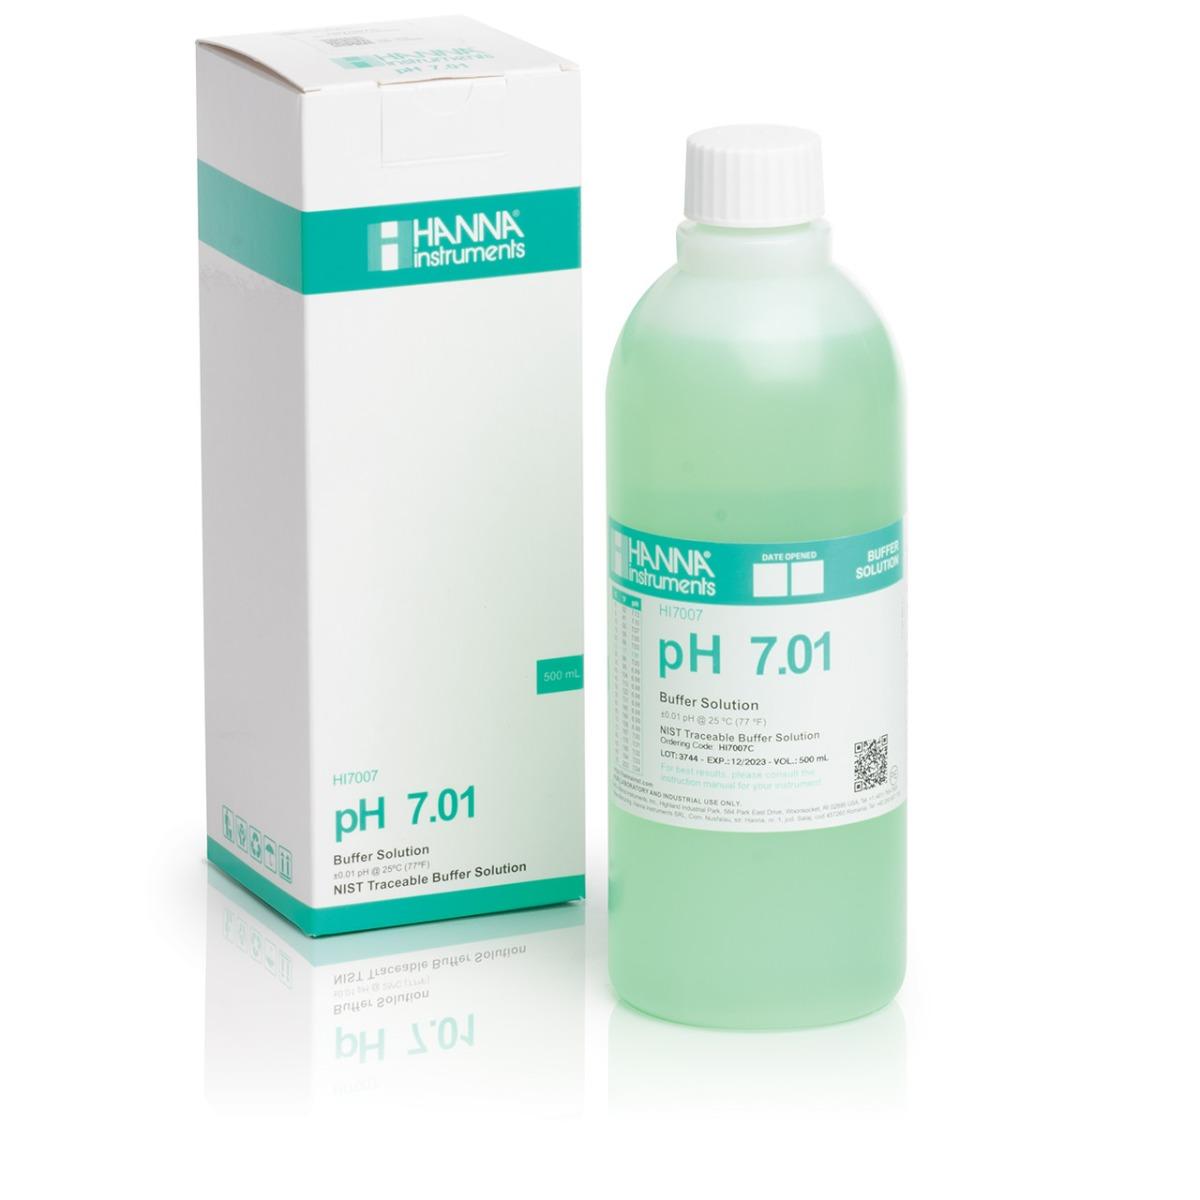 HI7007C pH 7.01 Calibration Solution (500 mL)